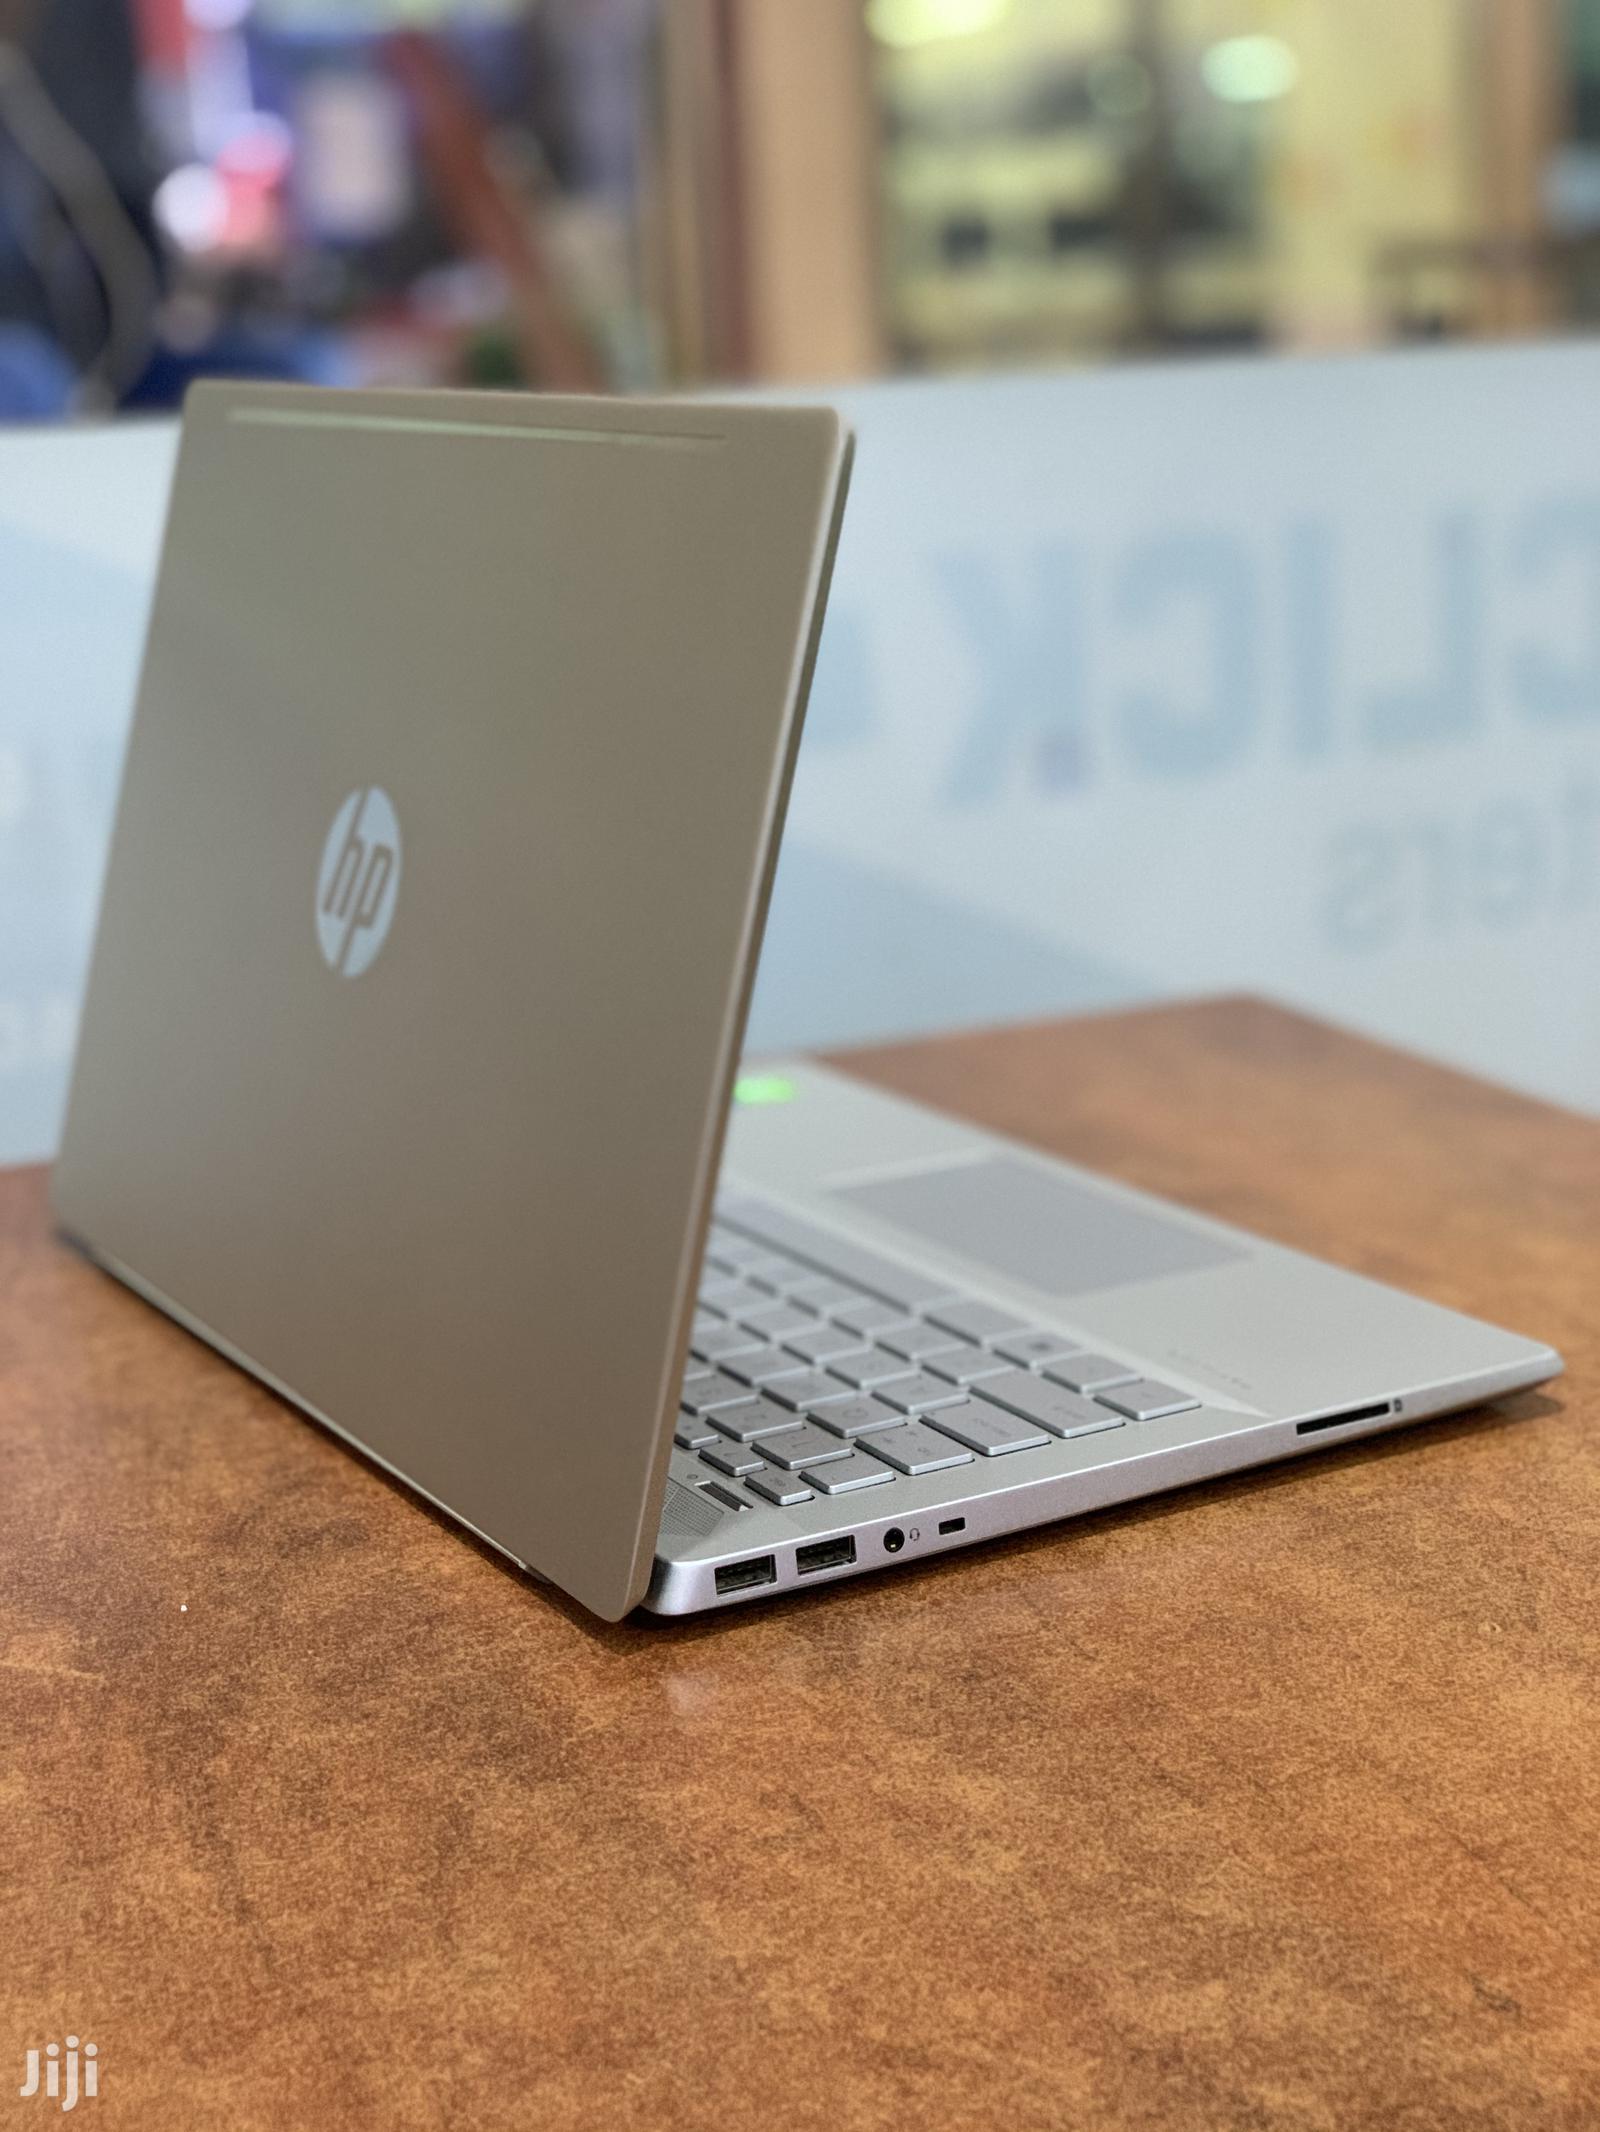 New Laptop HP Pavilion 14 8GB Intel Core I5 SSHD (Hybrid) 256GB | Laptops & Computers for sale in Kampala, Central Region, Uganda